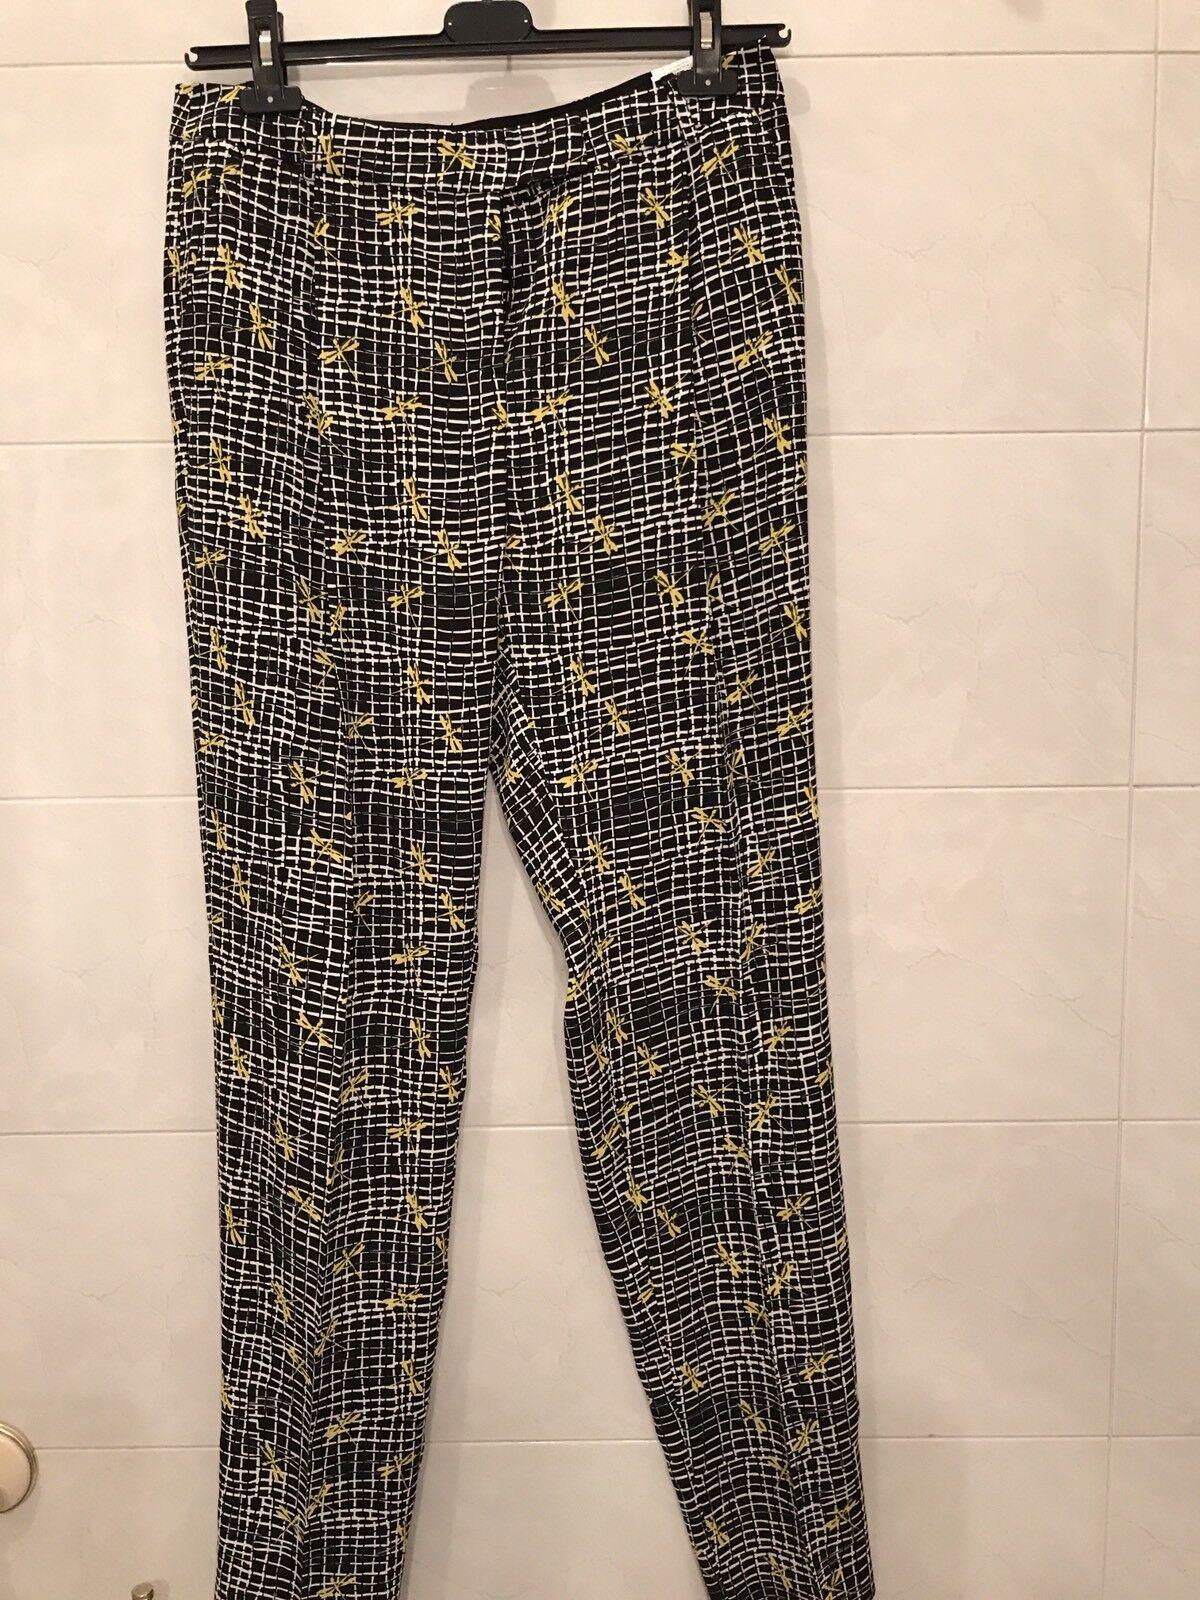 Pantalone Pennyblak By Max Mara Tg 46